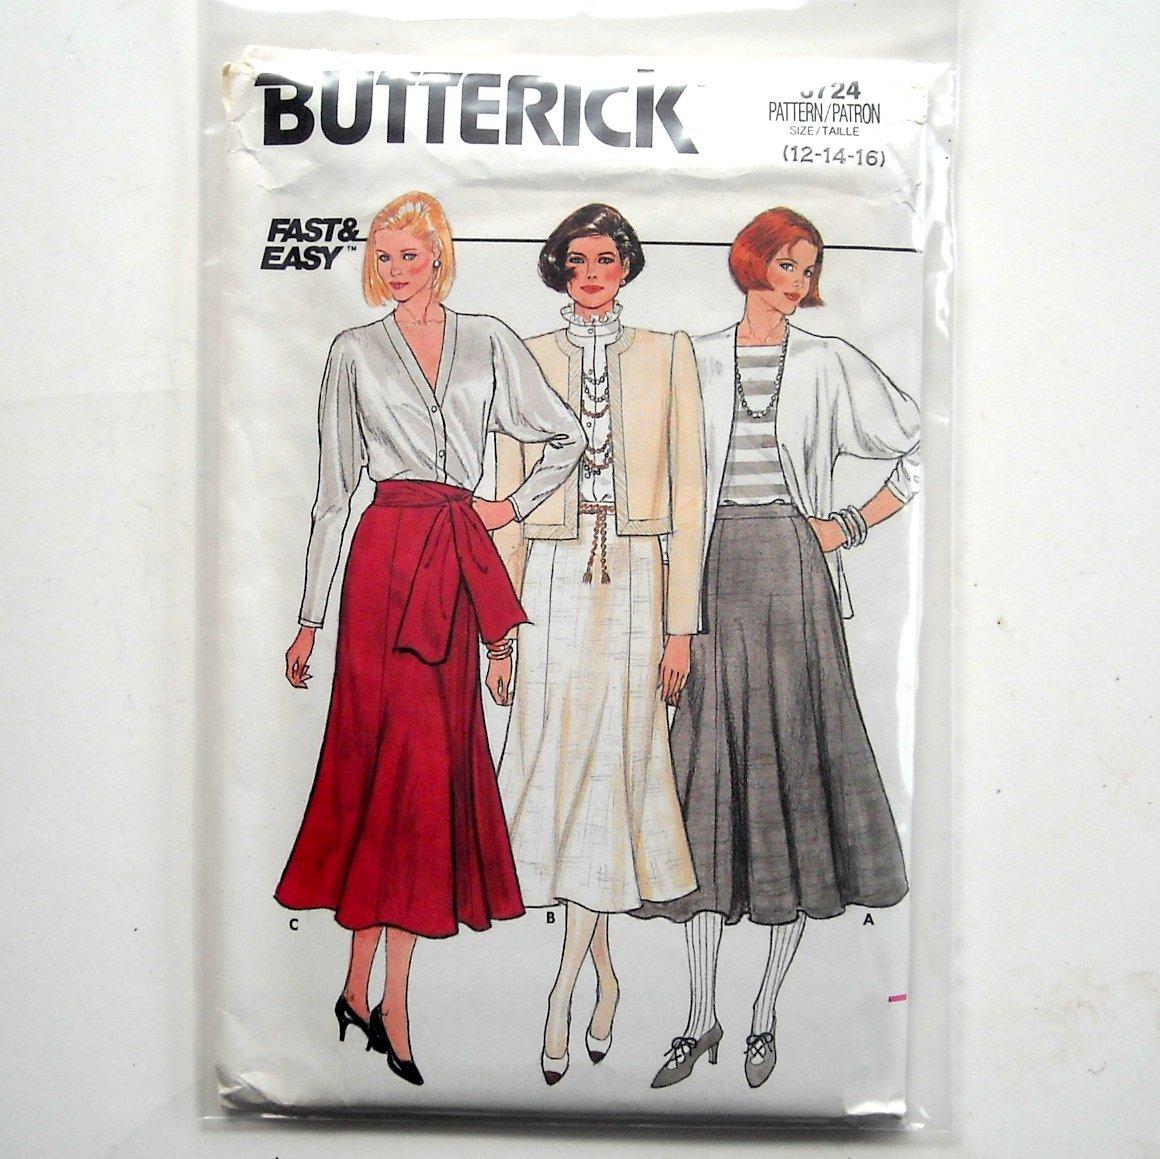 Skirt Misses 12 14 16 Vintage Butterick Sewing Pattern 6724